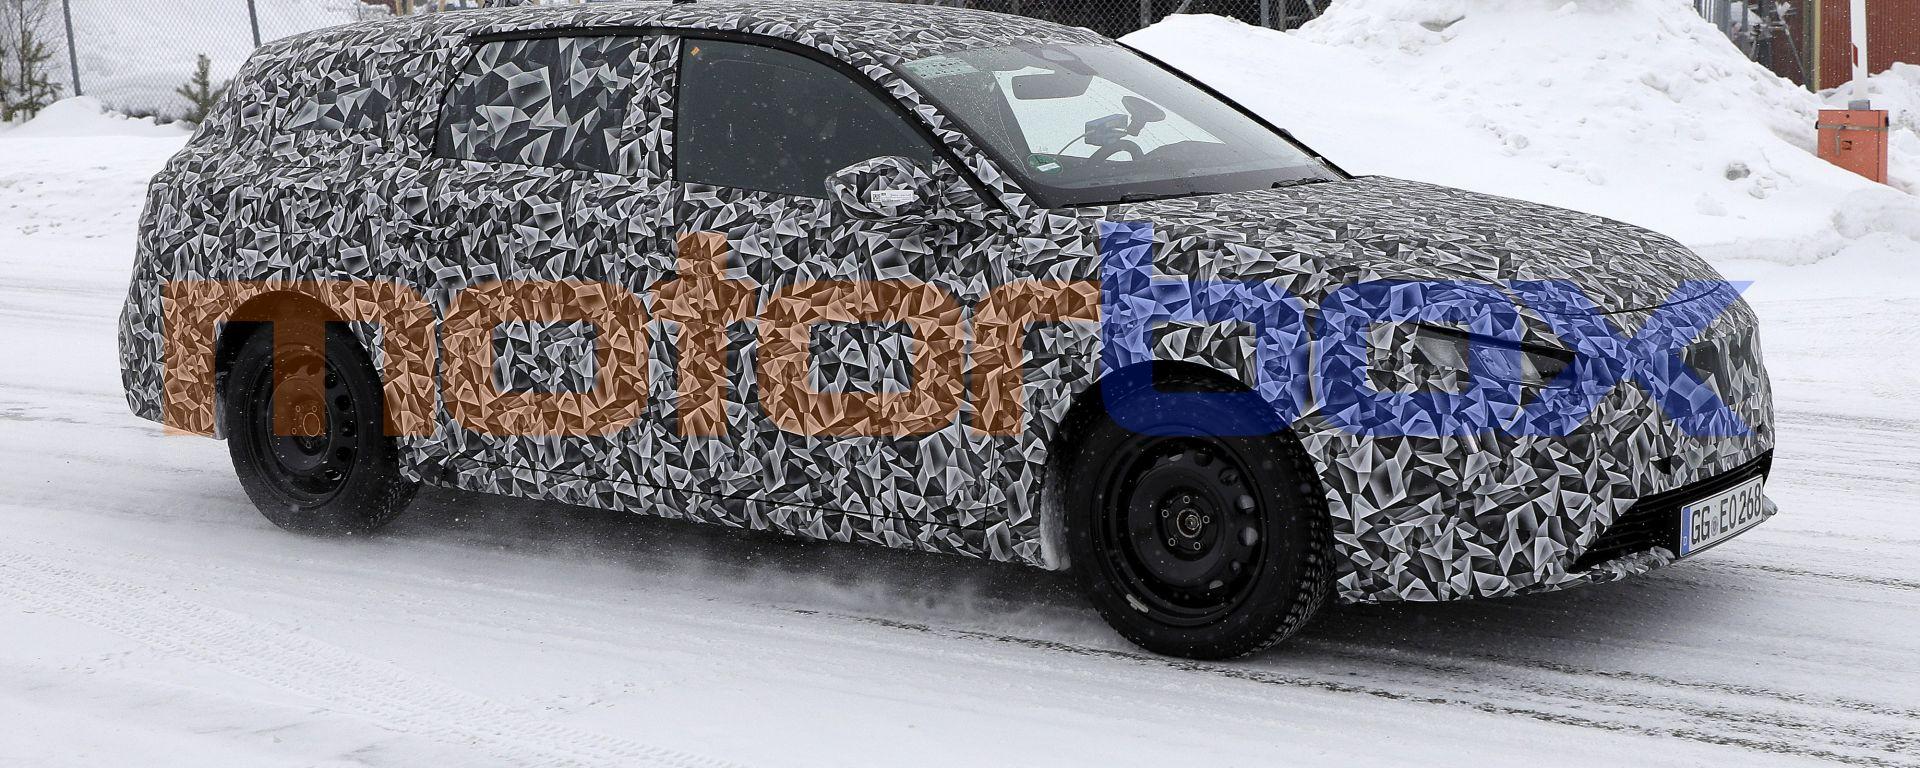 Peugeot 308 SW 2022, nuove foto spia